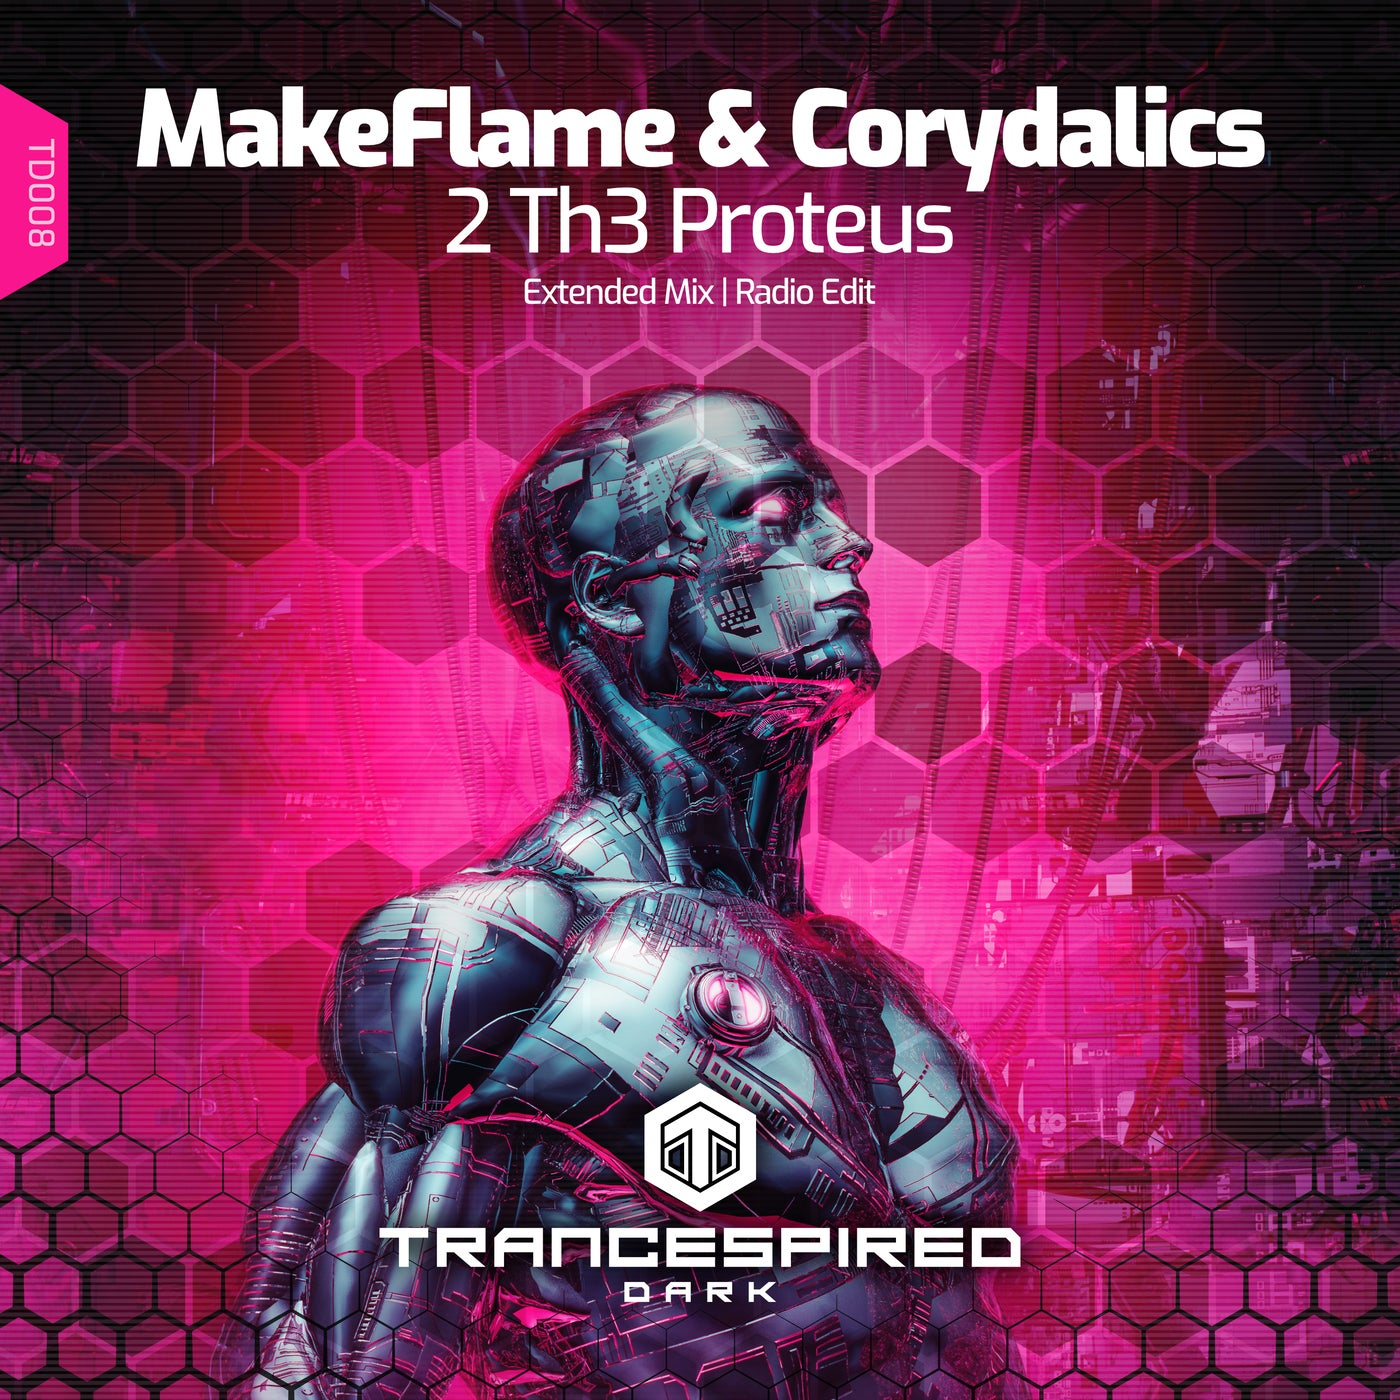 2 Th3 Proteus